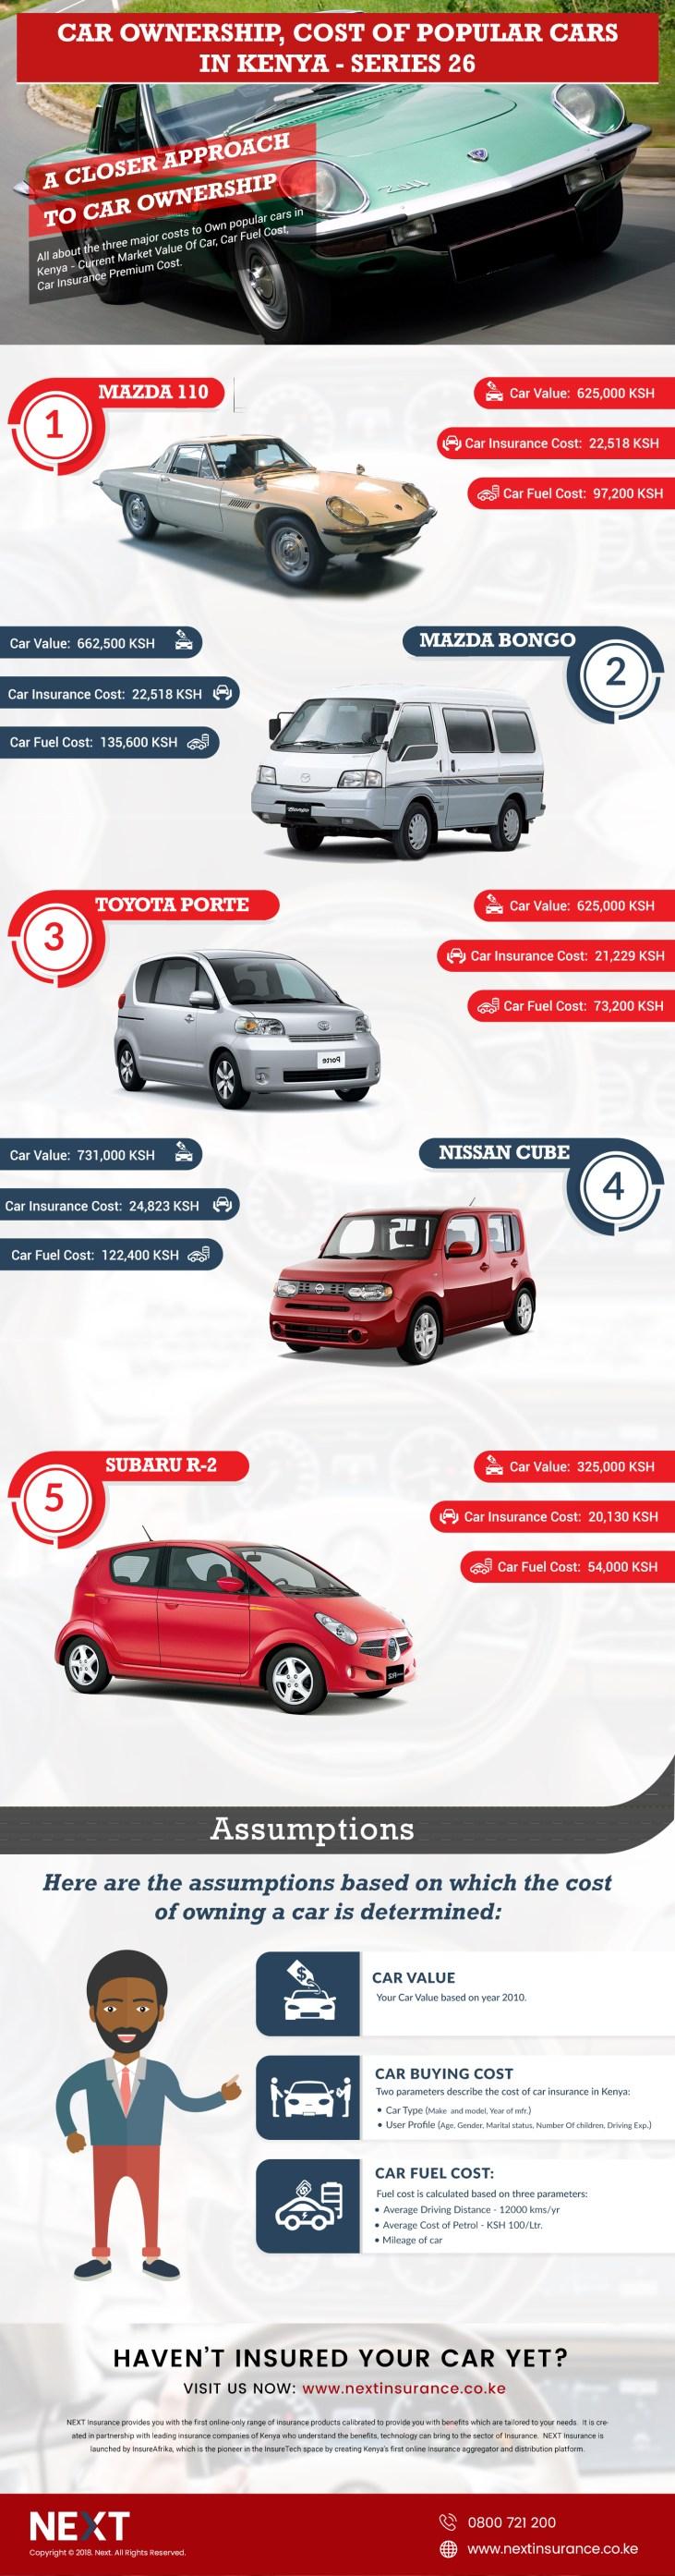 Car Ownership Cost Kenya 🚗 Infographic #26